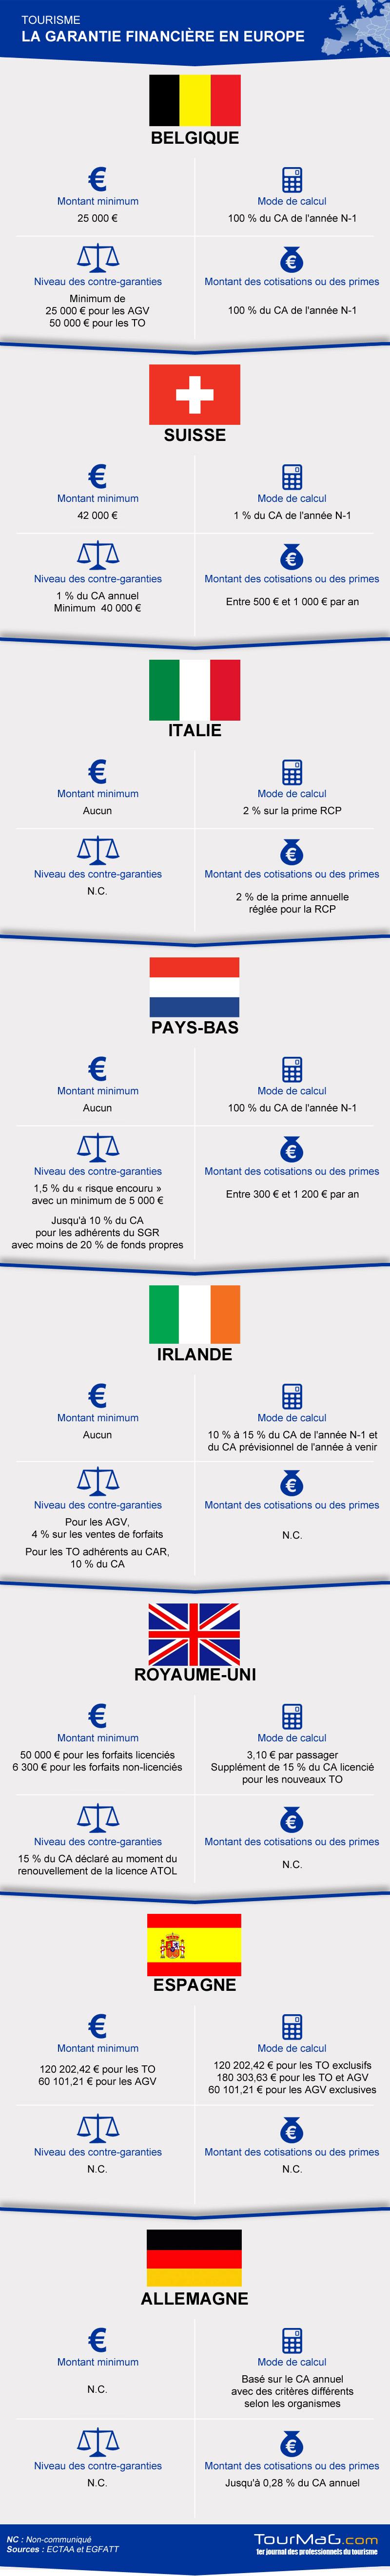 Garantie financière en Europe